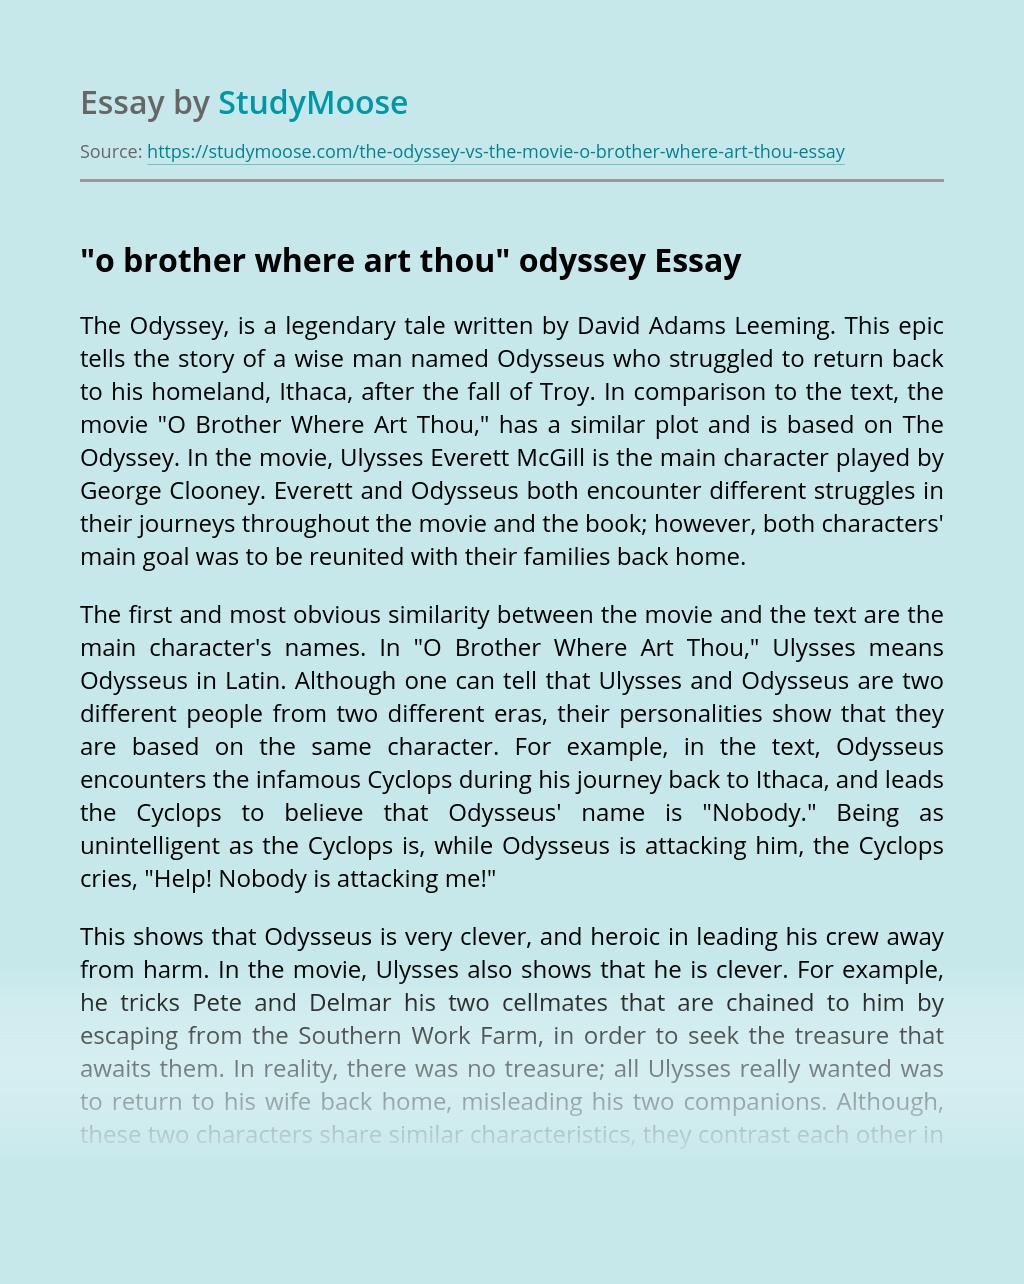 """o brother where art thou"" odyssey"